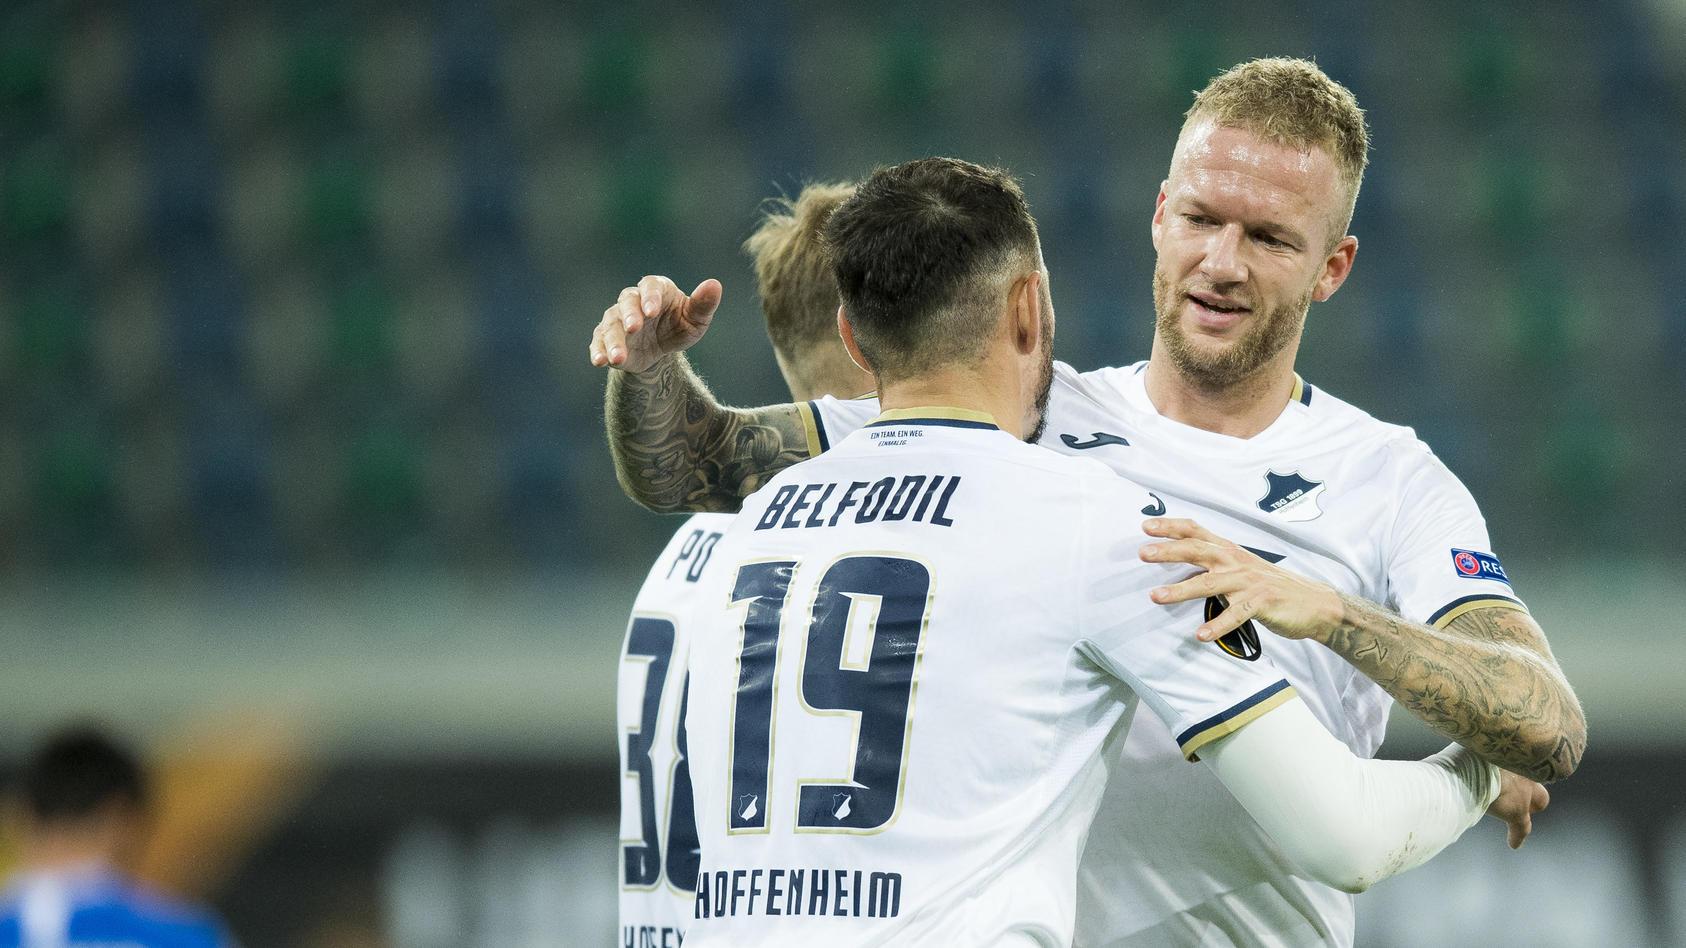 Hoffenheim siegt gegen KAA Gent mit 3:0.